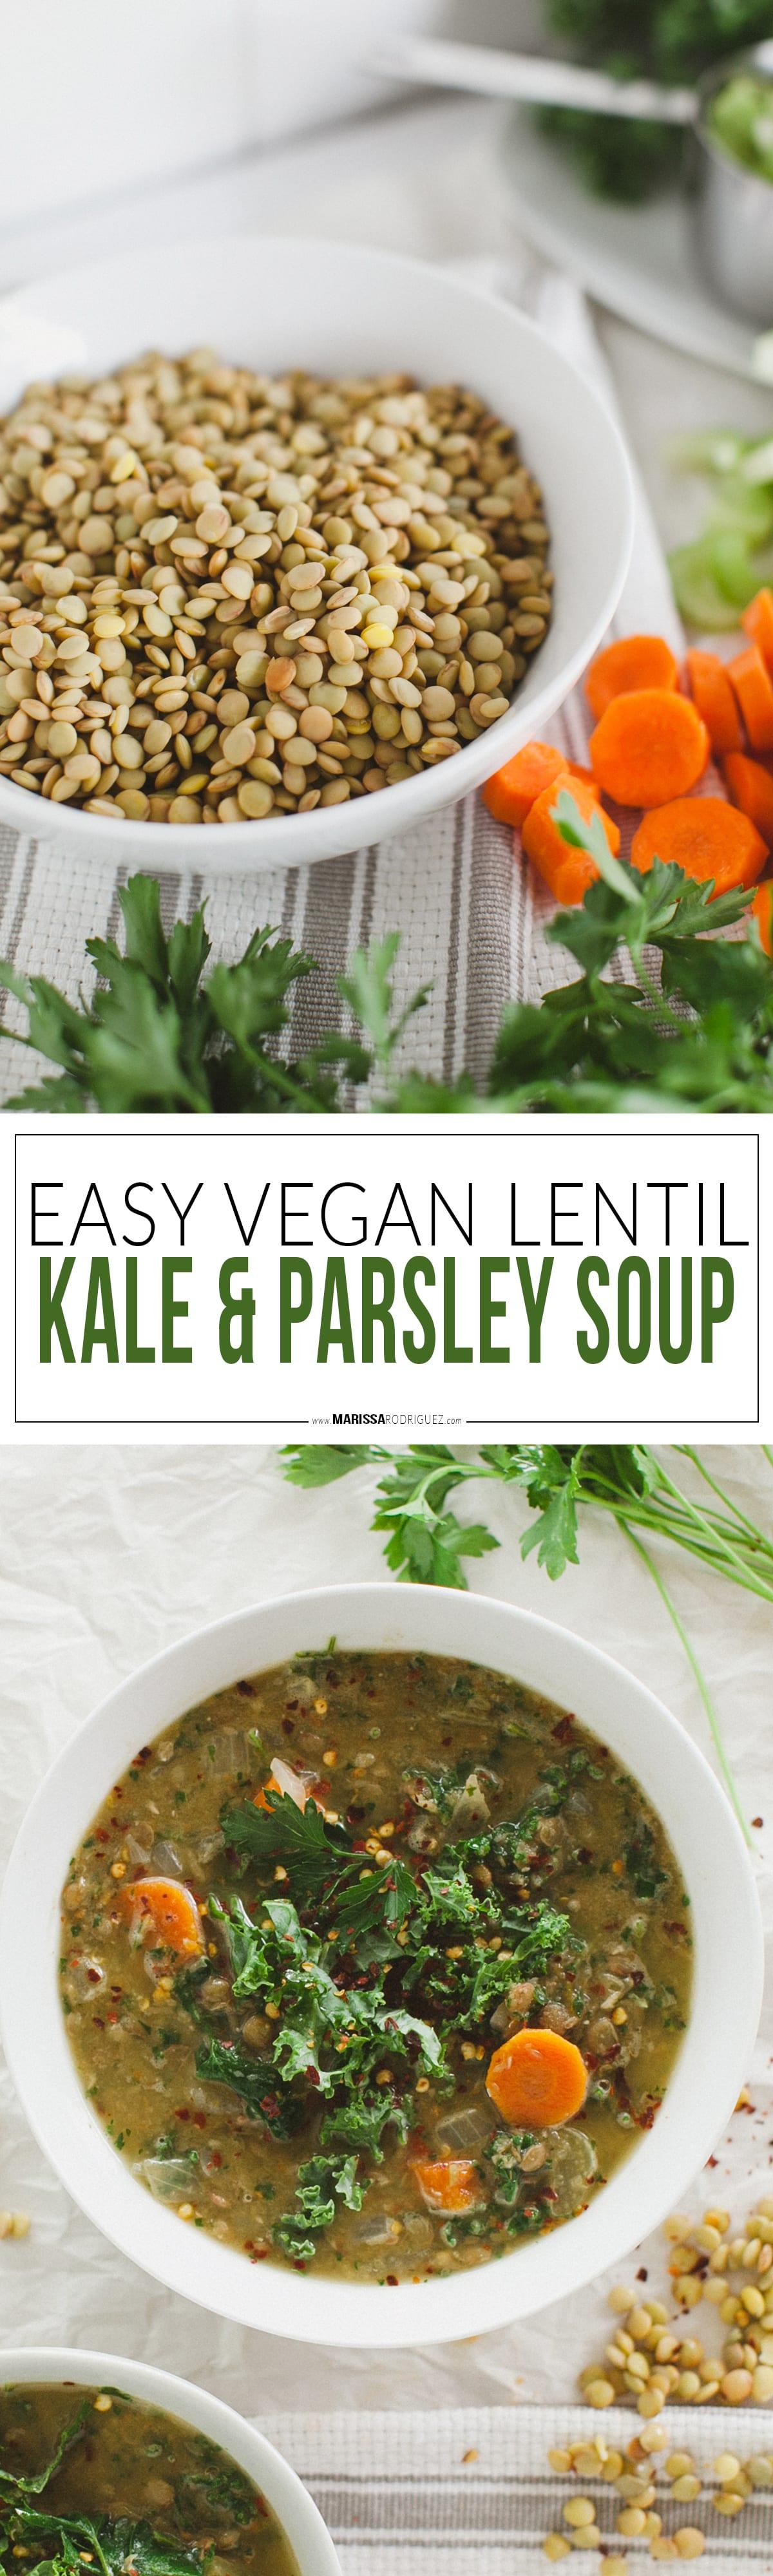 easy vegan lentil parsley and kale soup